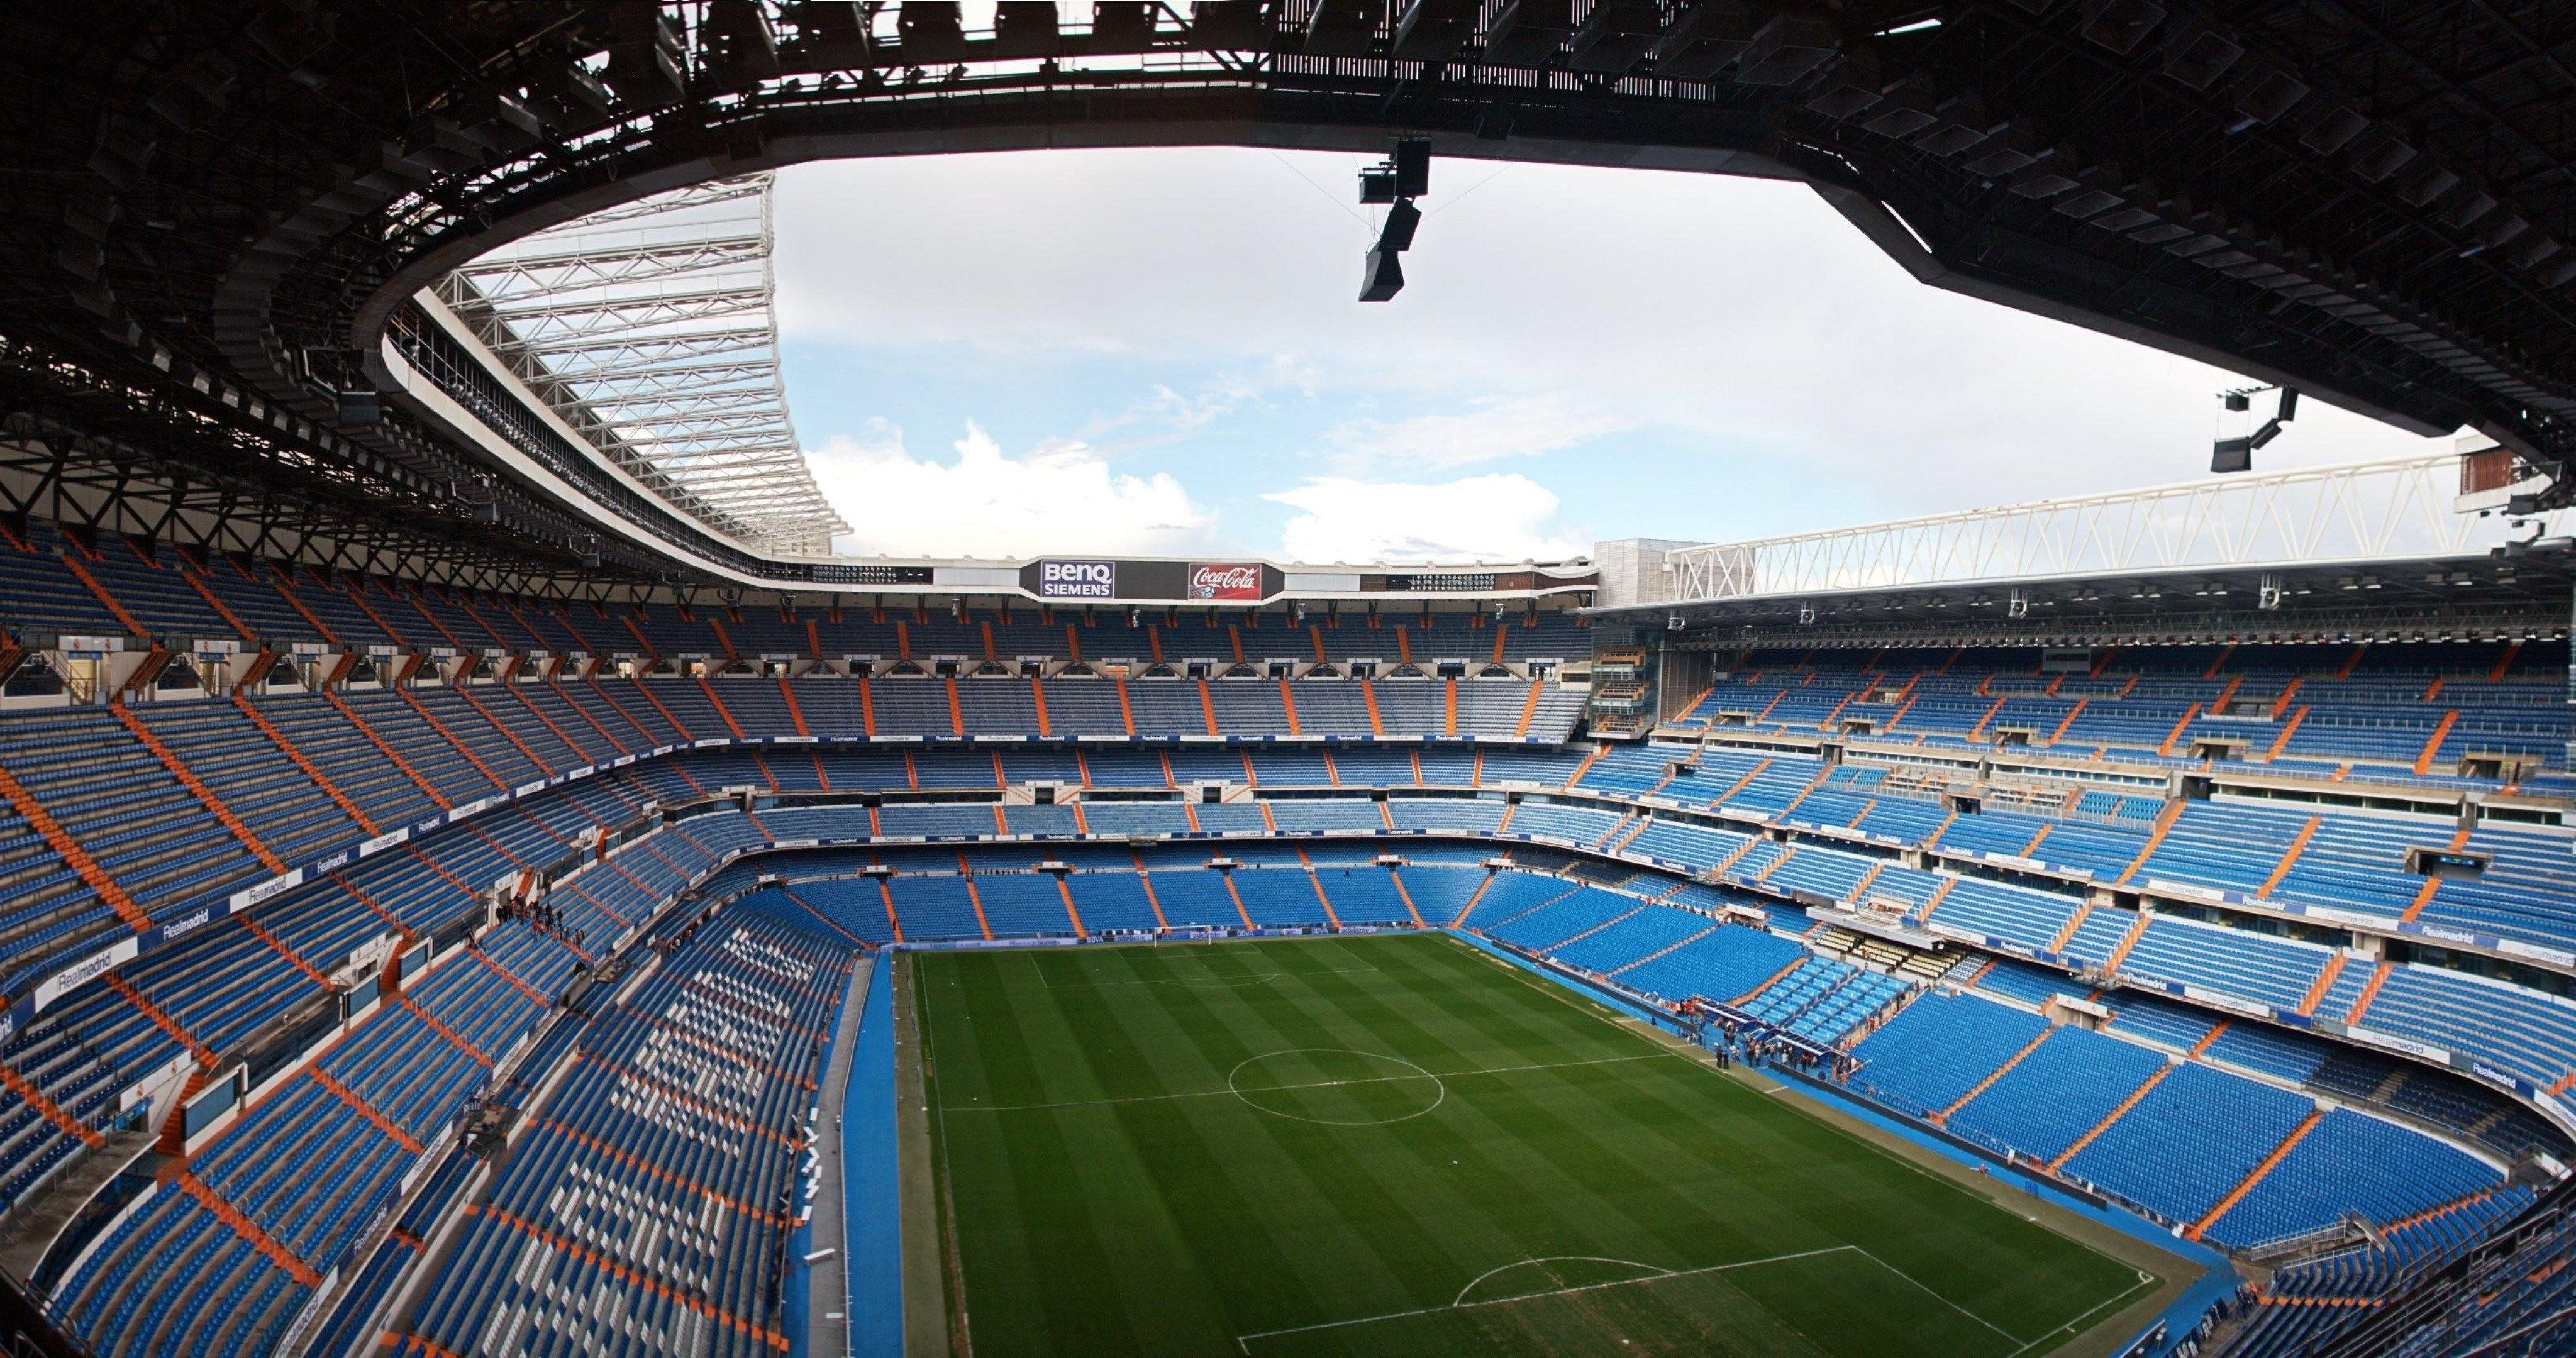 santiago bernabeu real madrid stadion 4k ultra hd